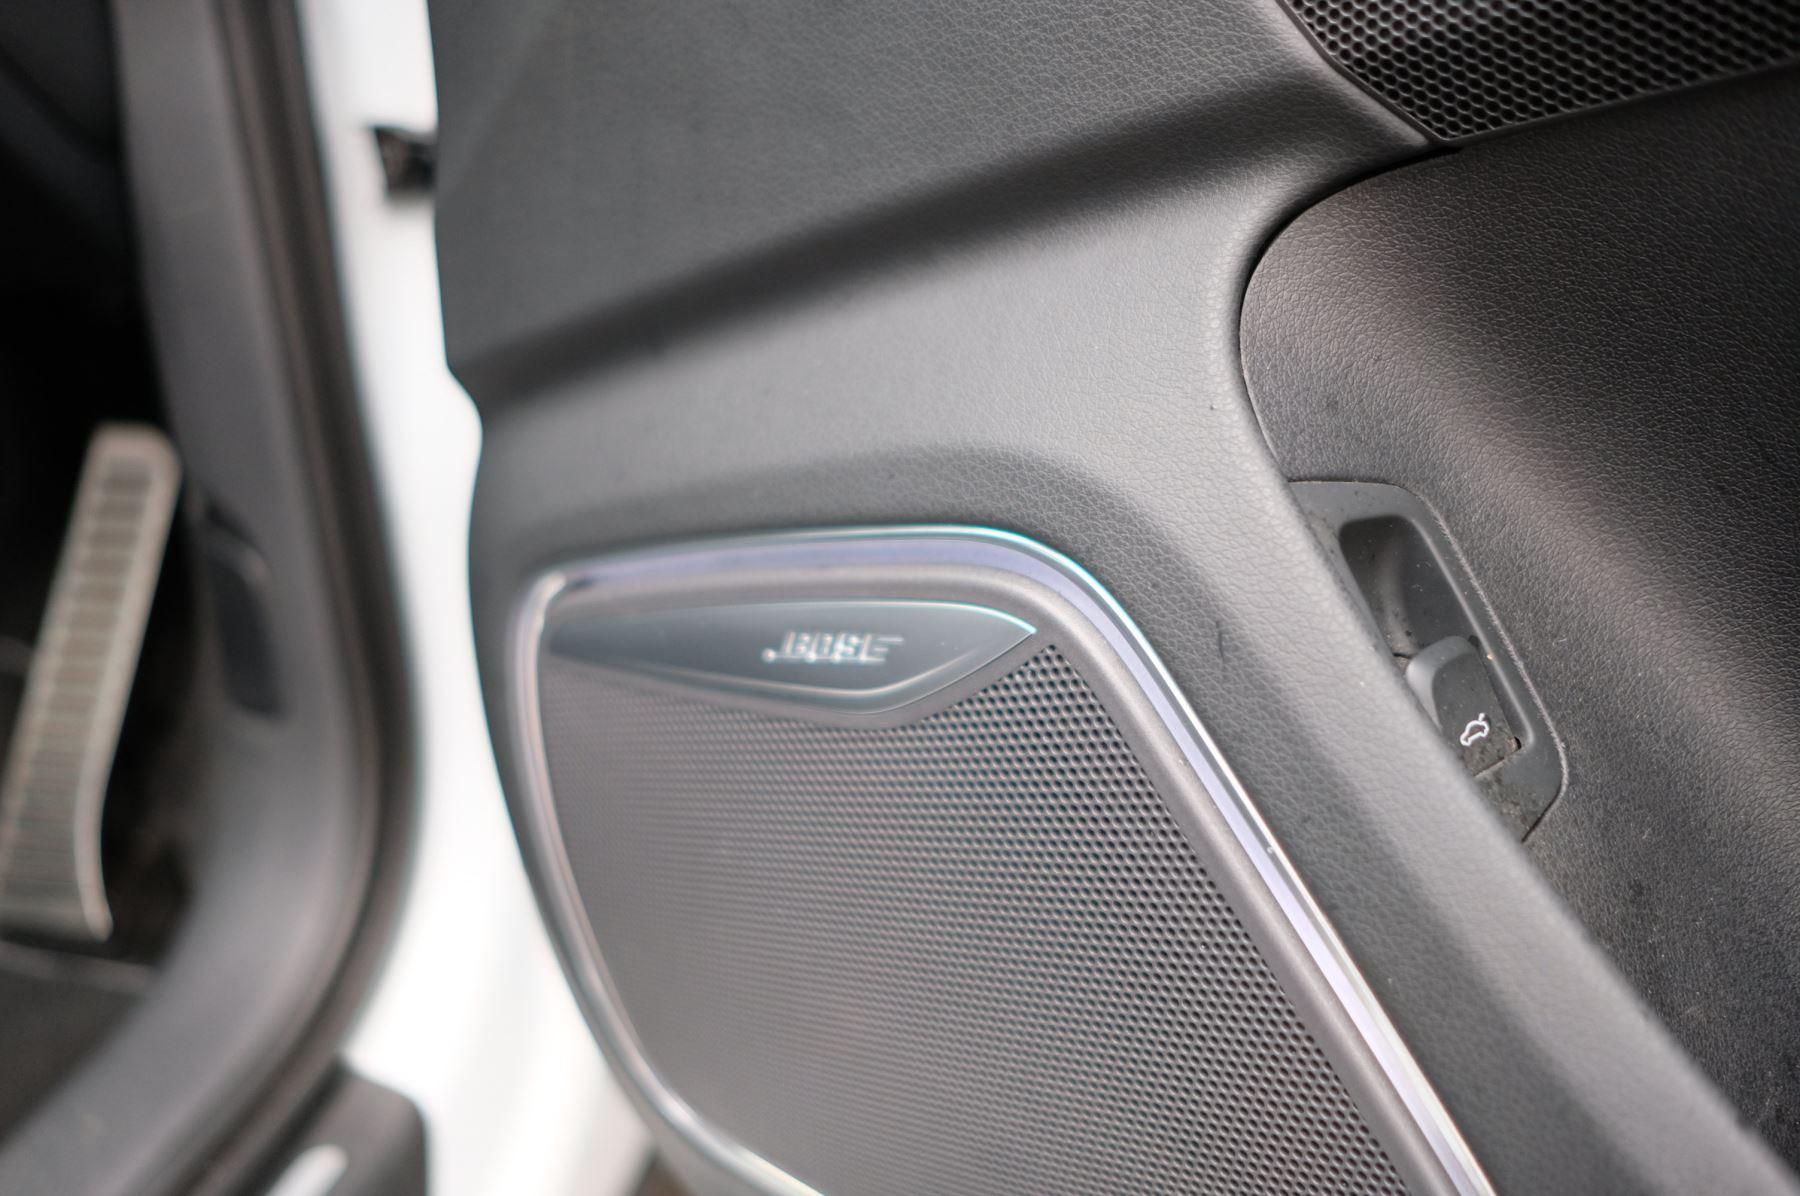 Audi Q3 2.0T FSI Quattro Black Edition 5dr S Tronic - Panoramic glass sunroof image 14